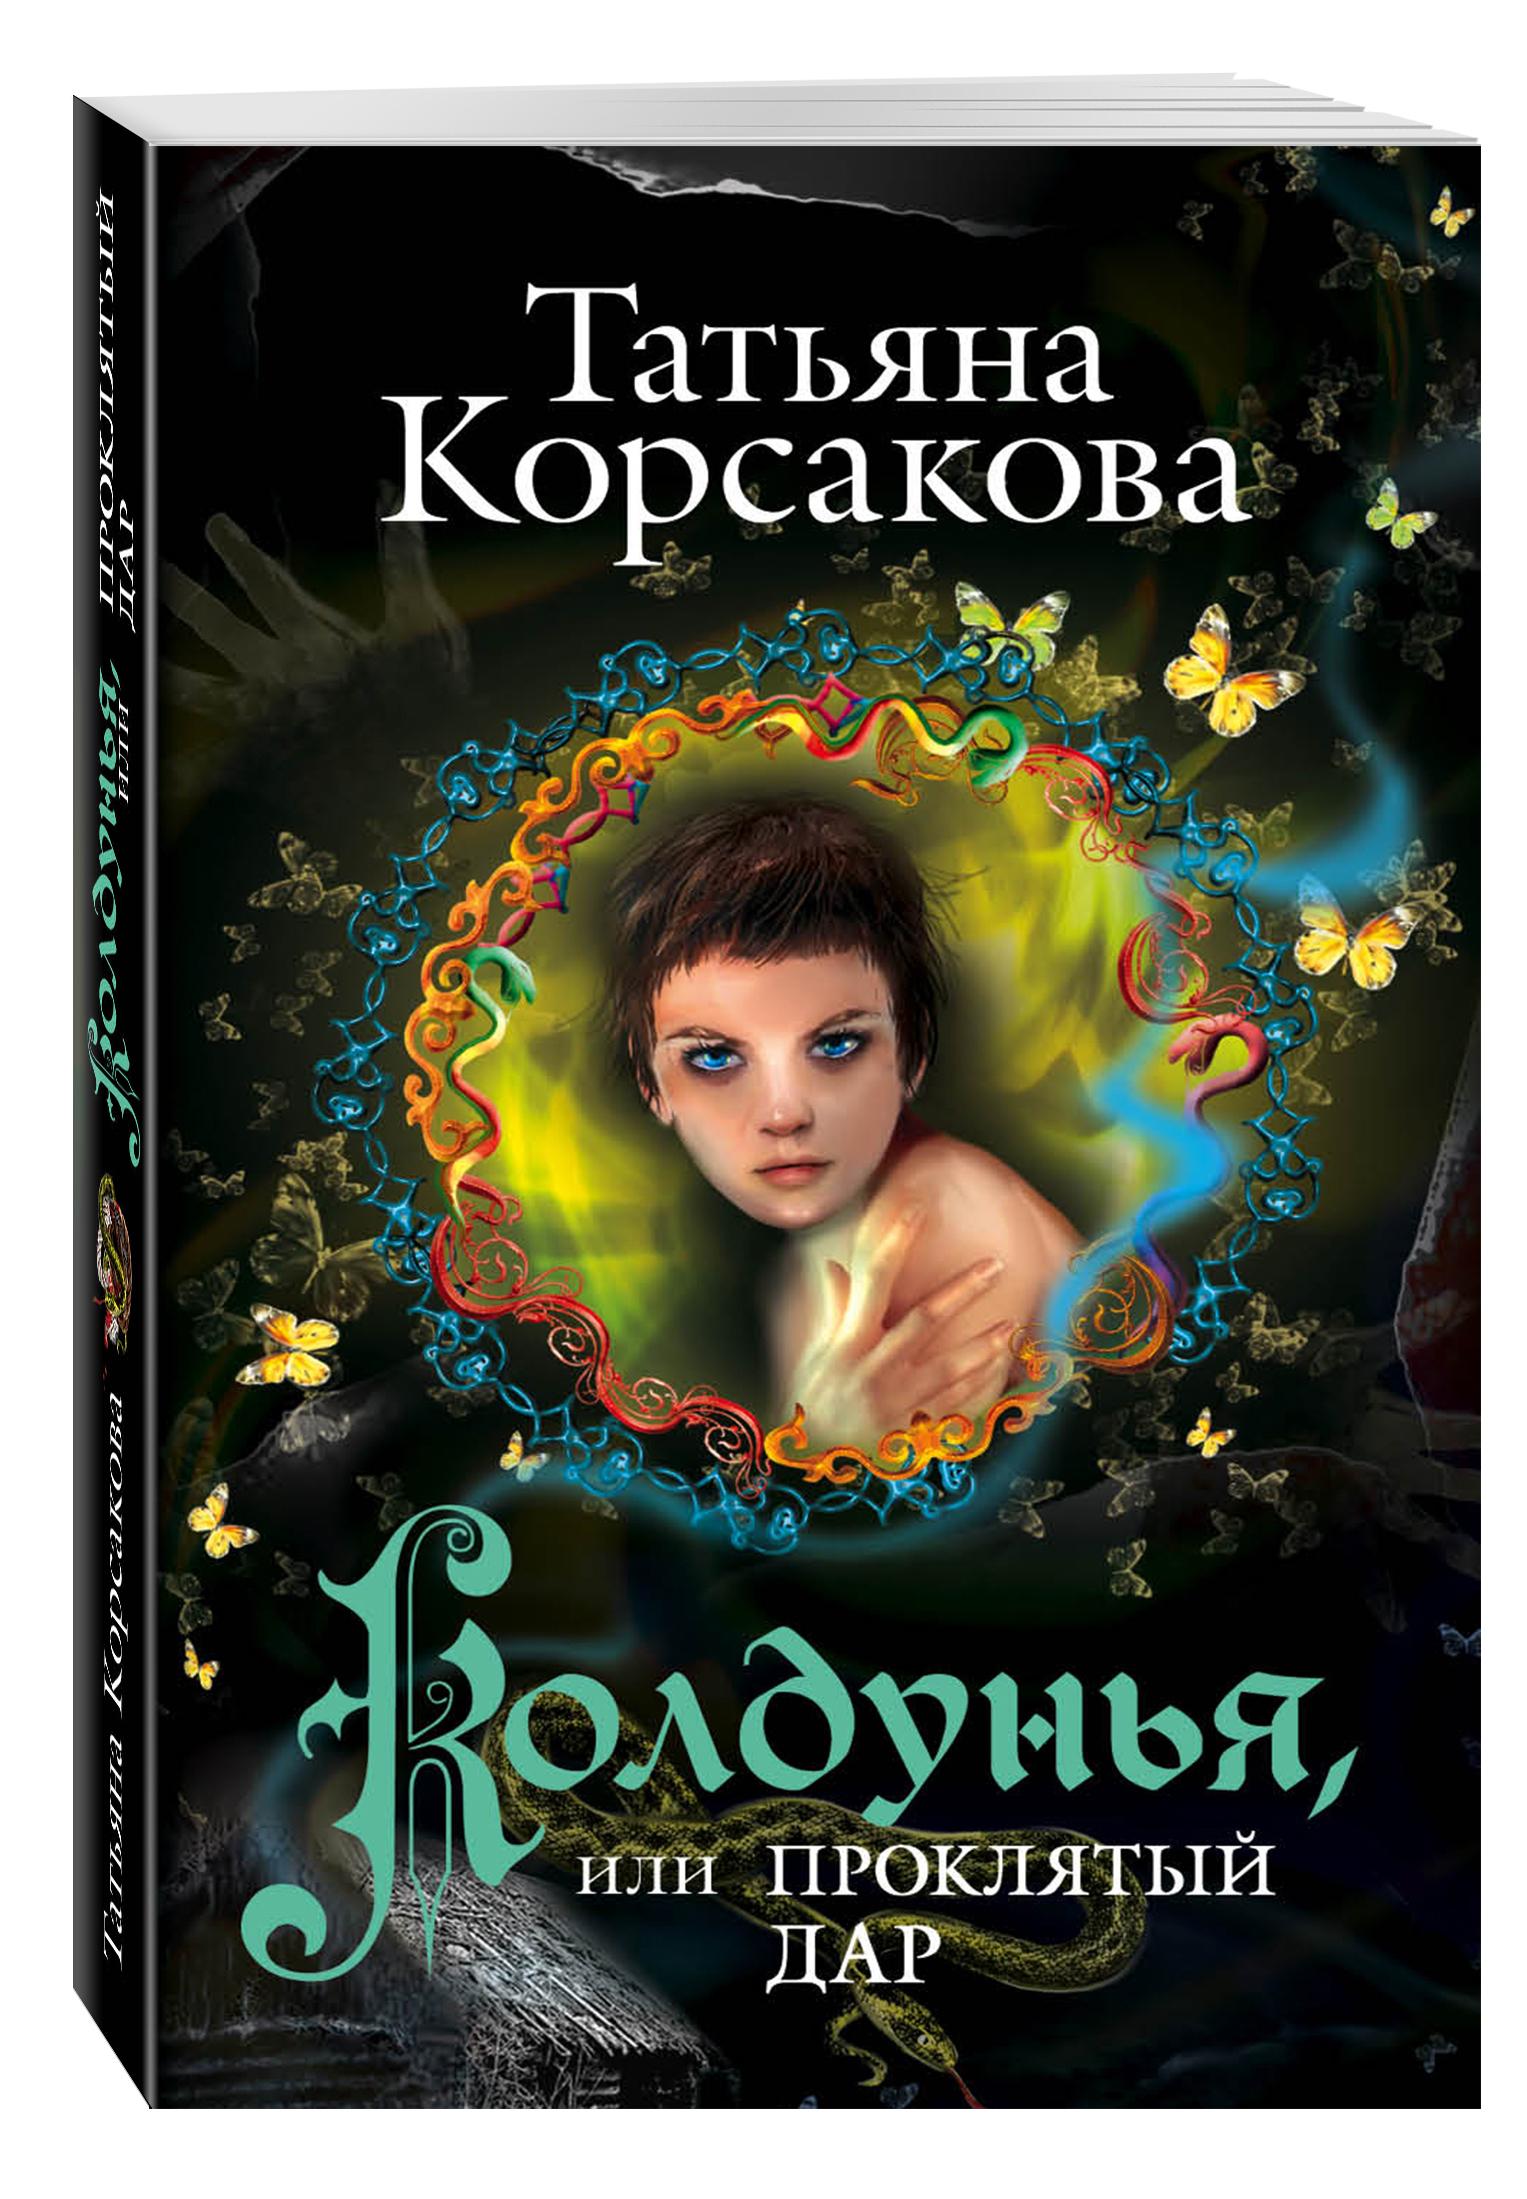 Корсакова Т. Колдунья, или Проклятый дар алексей валерьевич палысаев дар